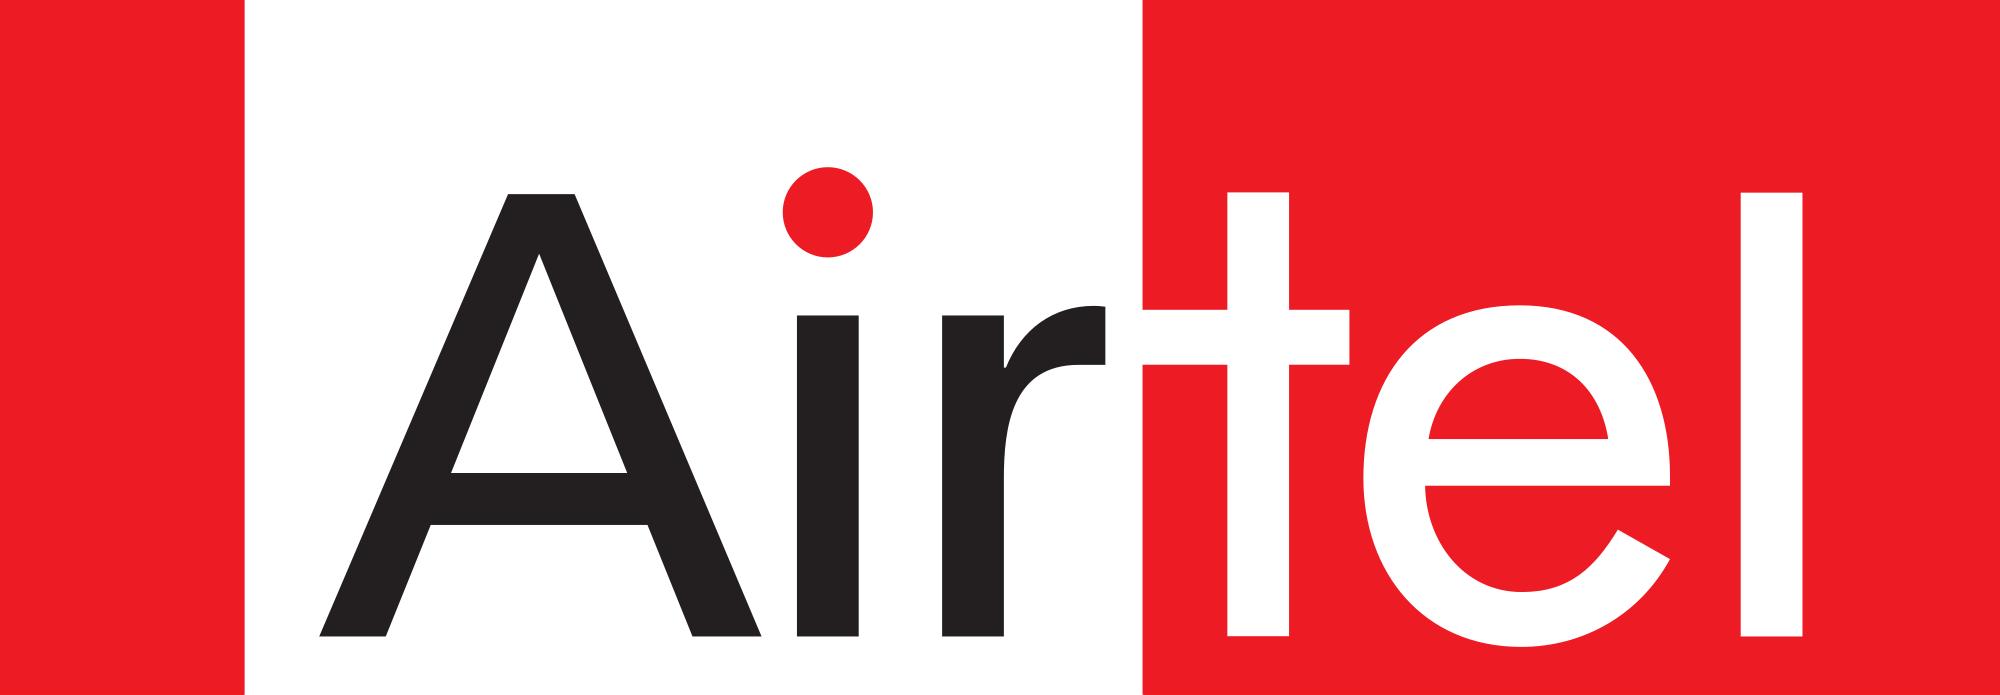 Airtel Logo PNG - 30451